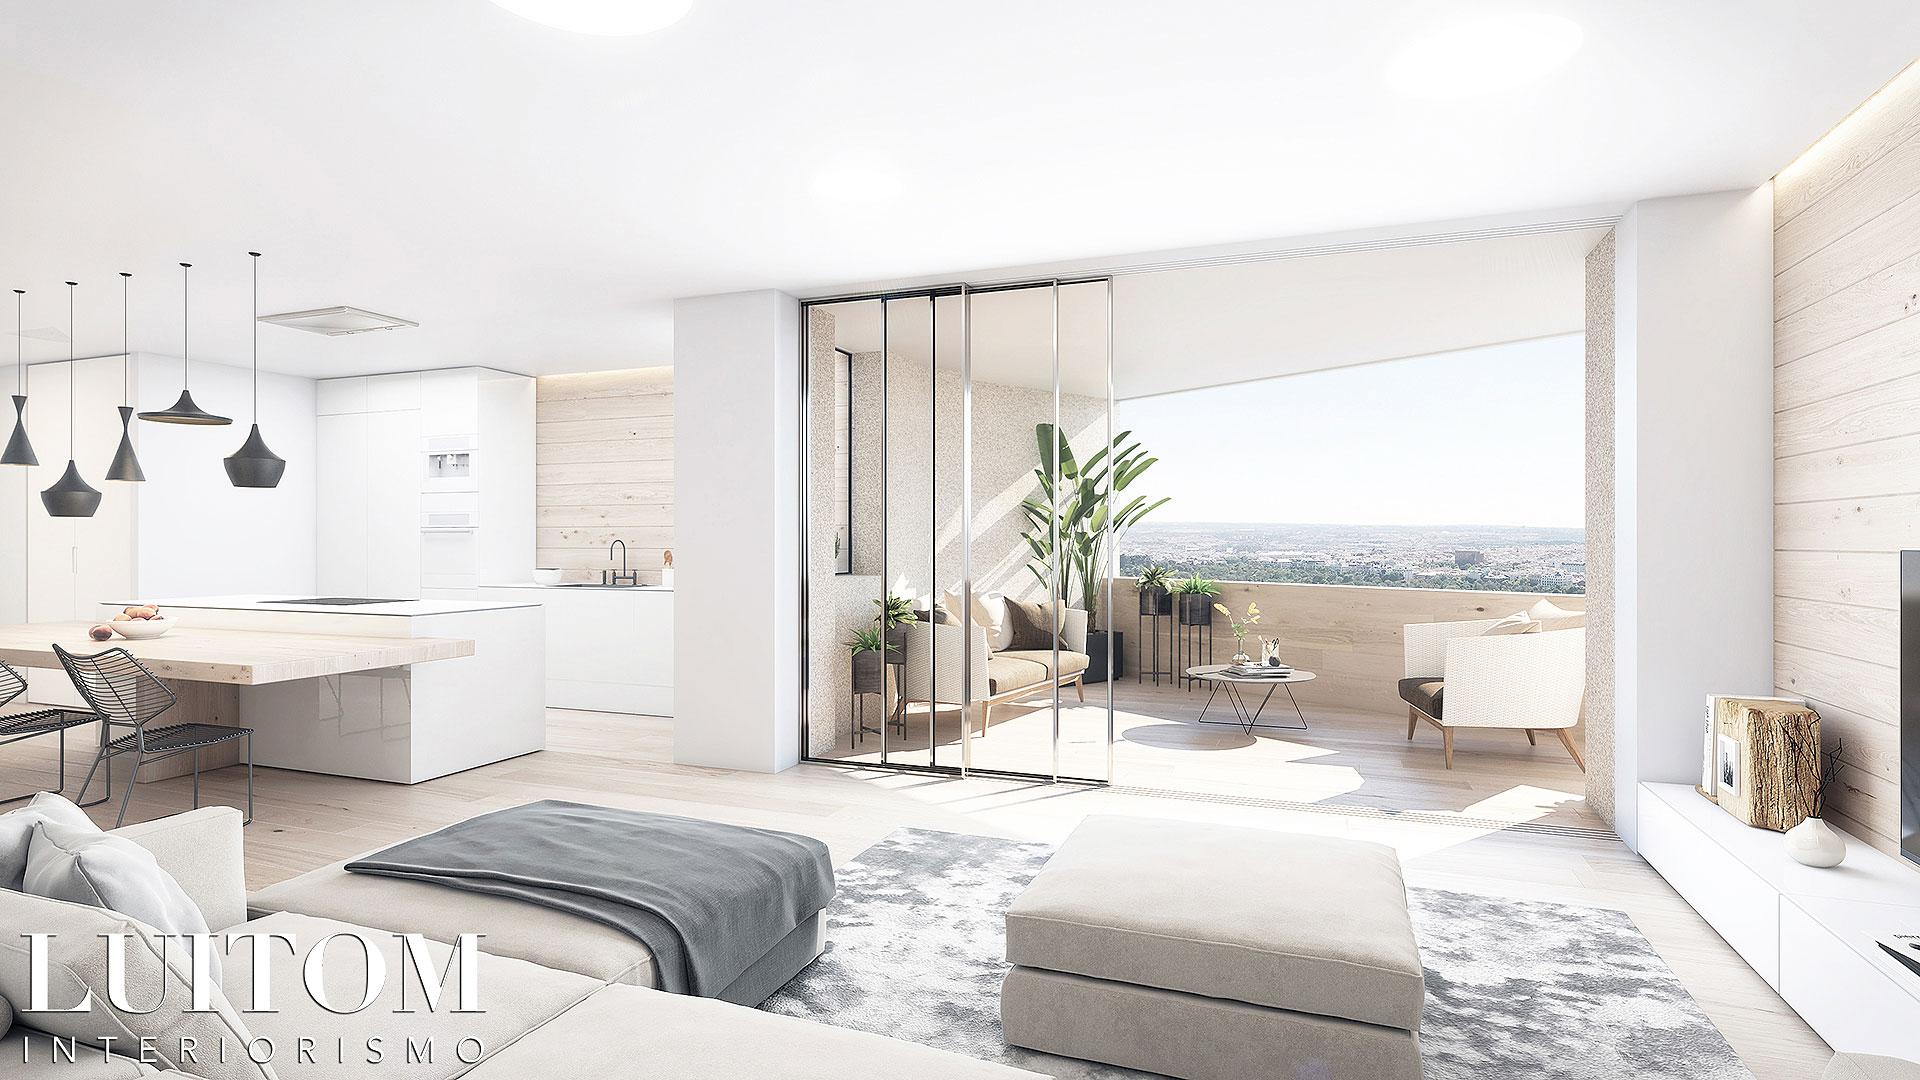 ideas-reformas-casas-lujo-interiorismo-decoracion-viviendas-luxury-home-living-kitchen-interior-design-61